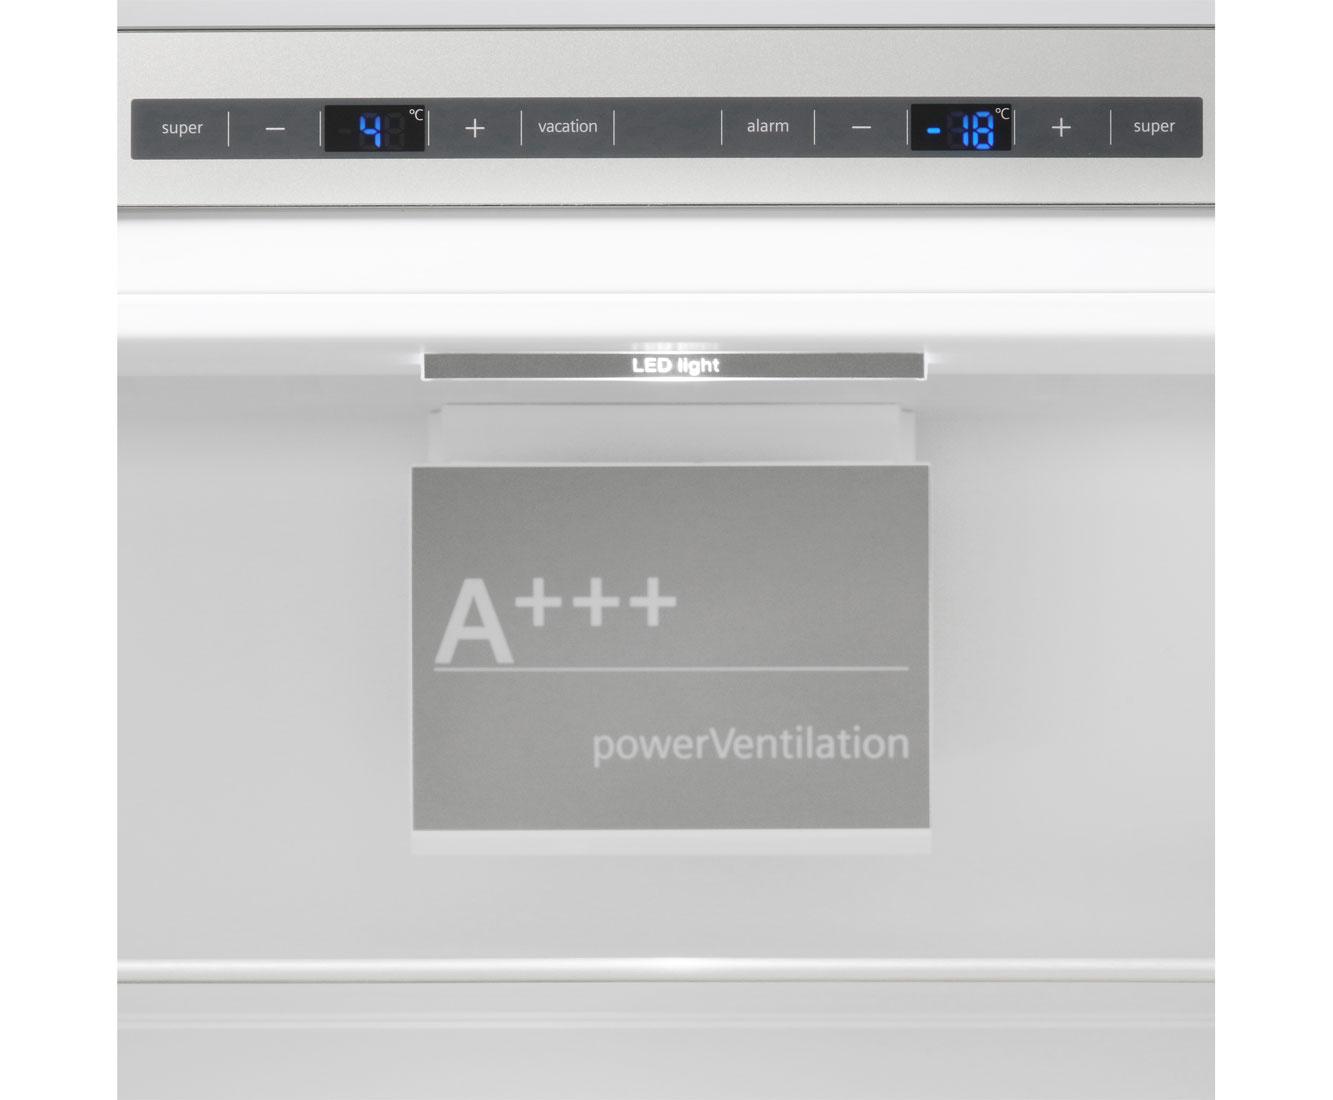 Siemens Kühlschrank Super Taste : Siemens eh bfb e iq autarkes induktions kochfeld glaskeramik